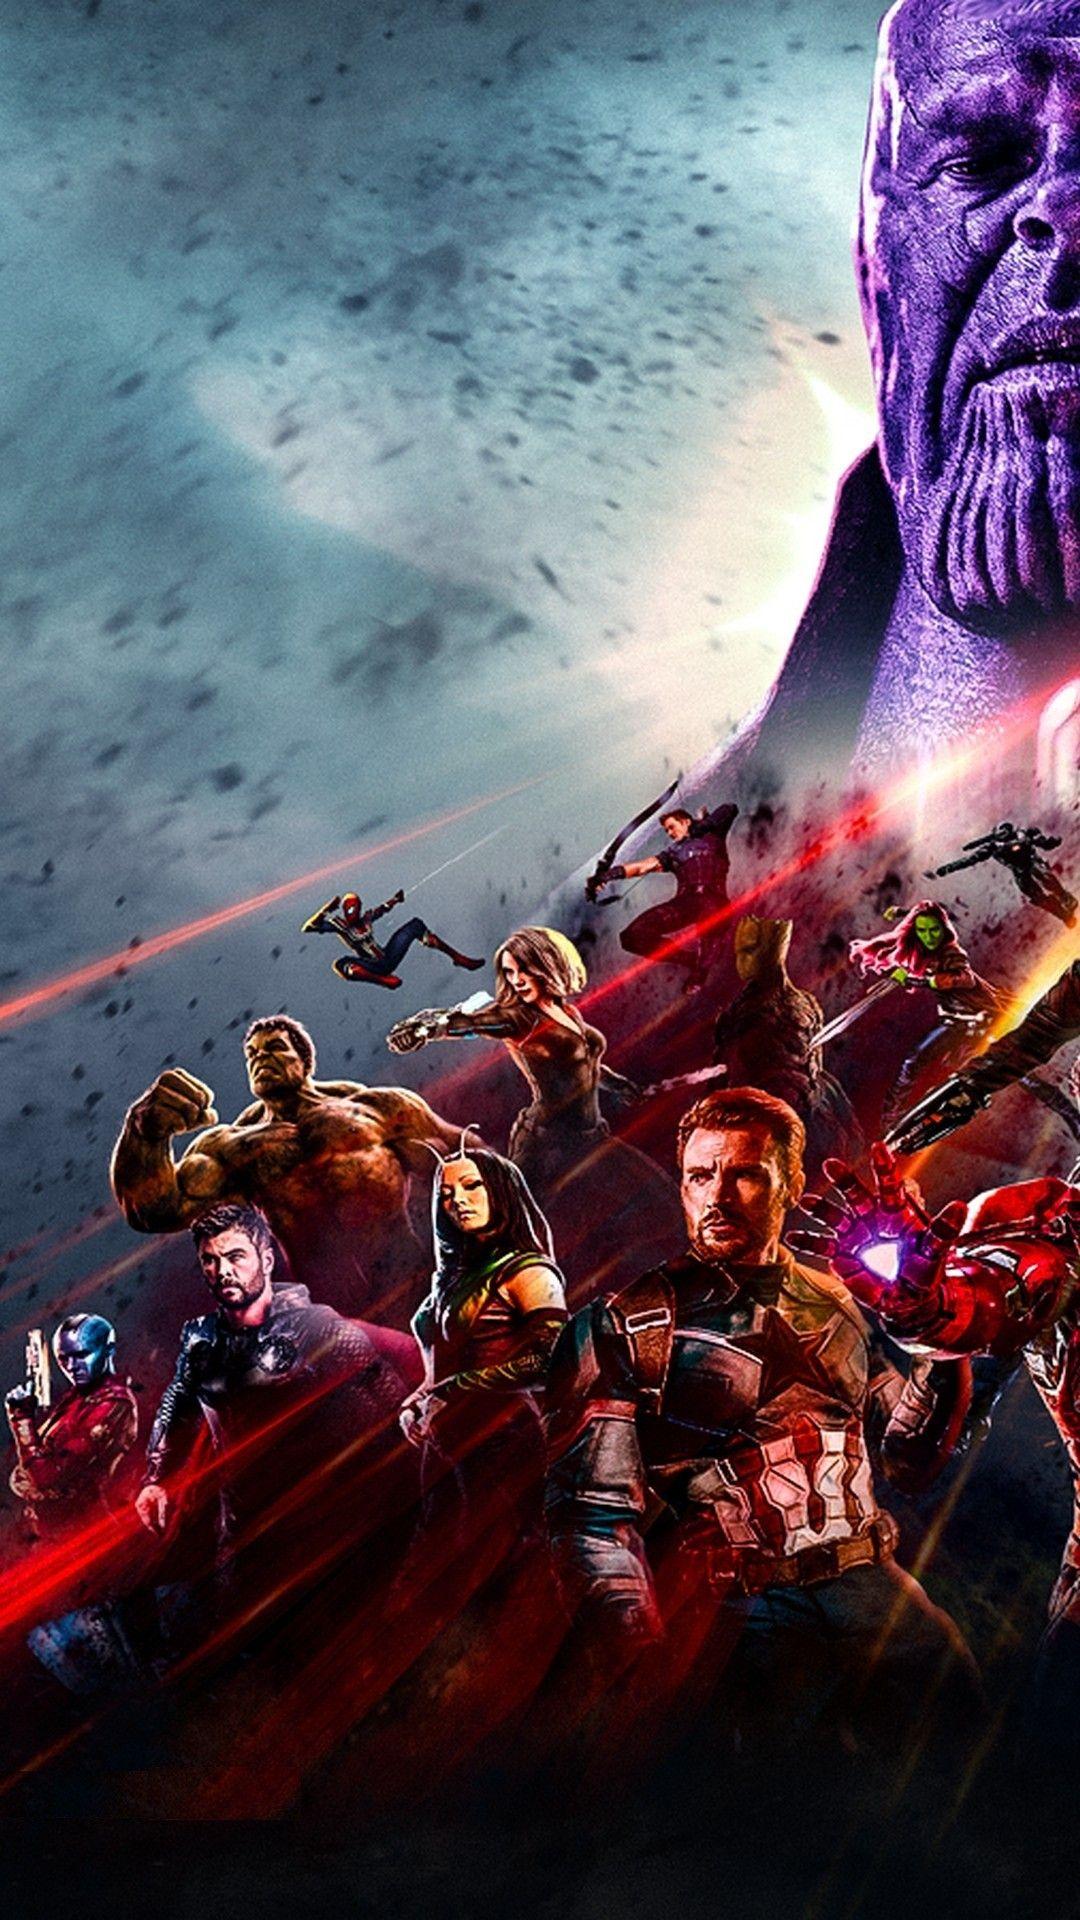 Avengers Infinity War Wallpaper iPhone   iPhoneWallpapers   Marvel, Avengers, Marvel heroes